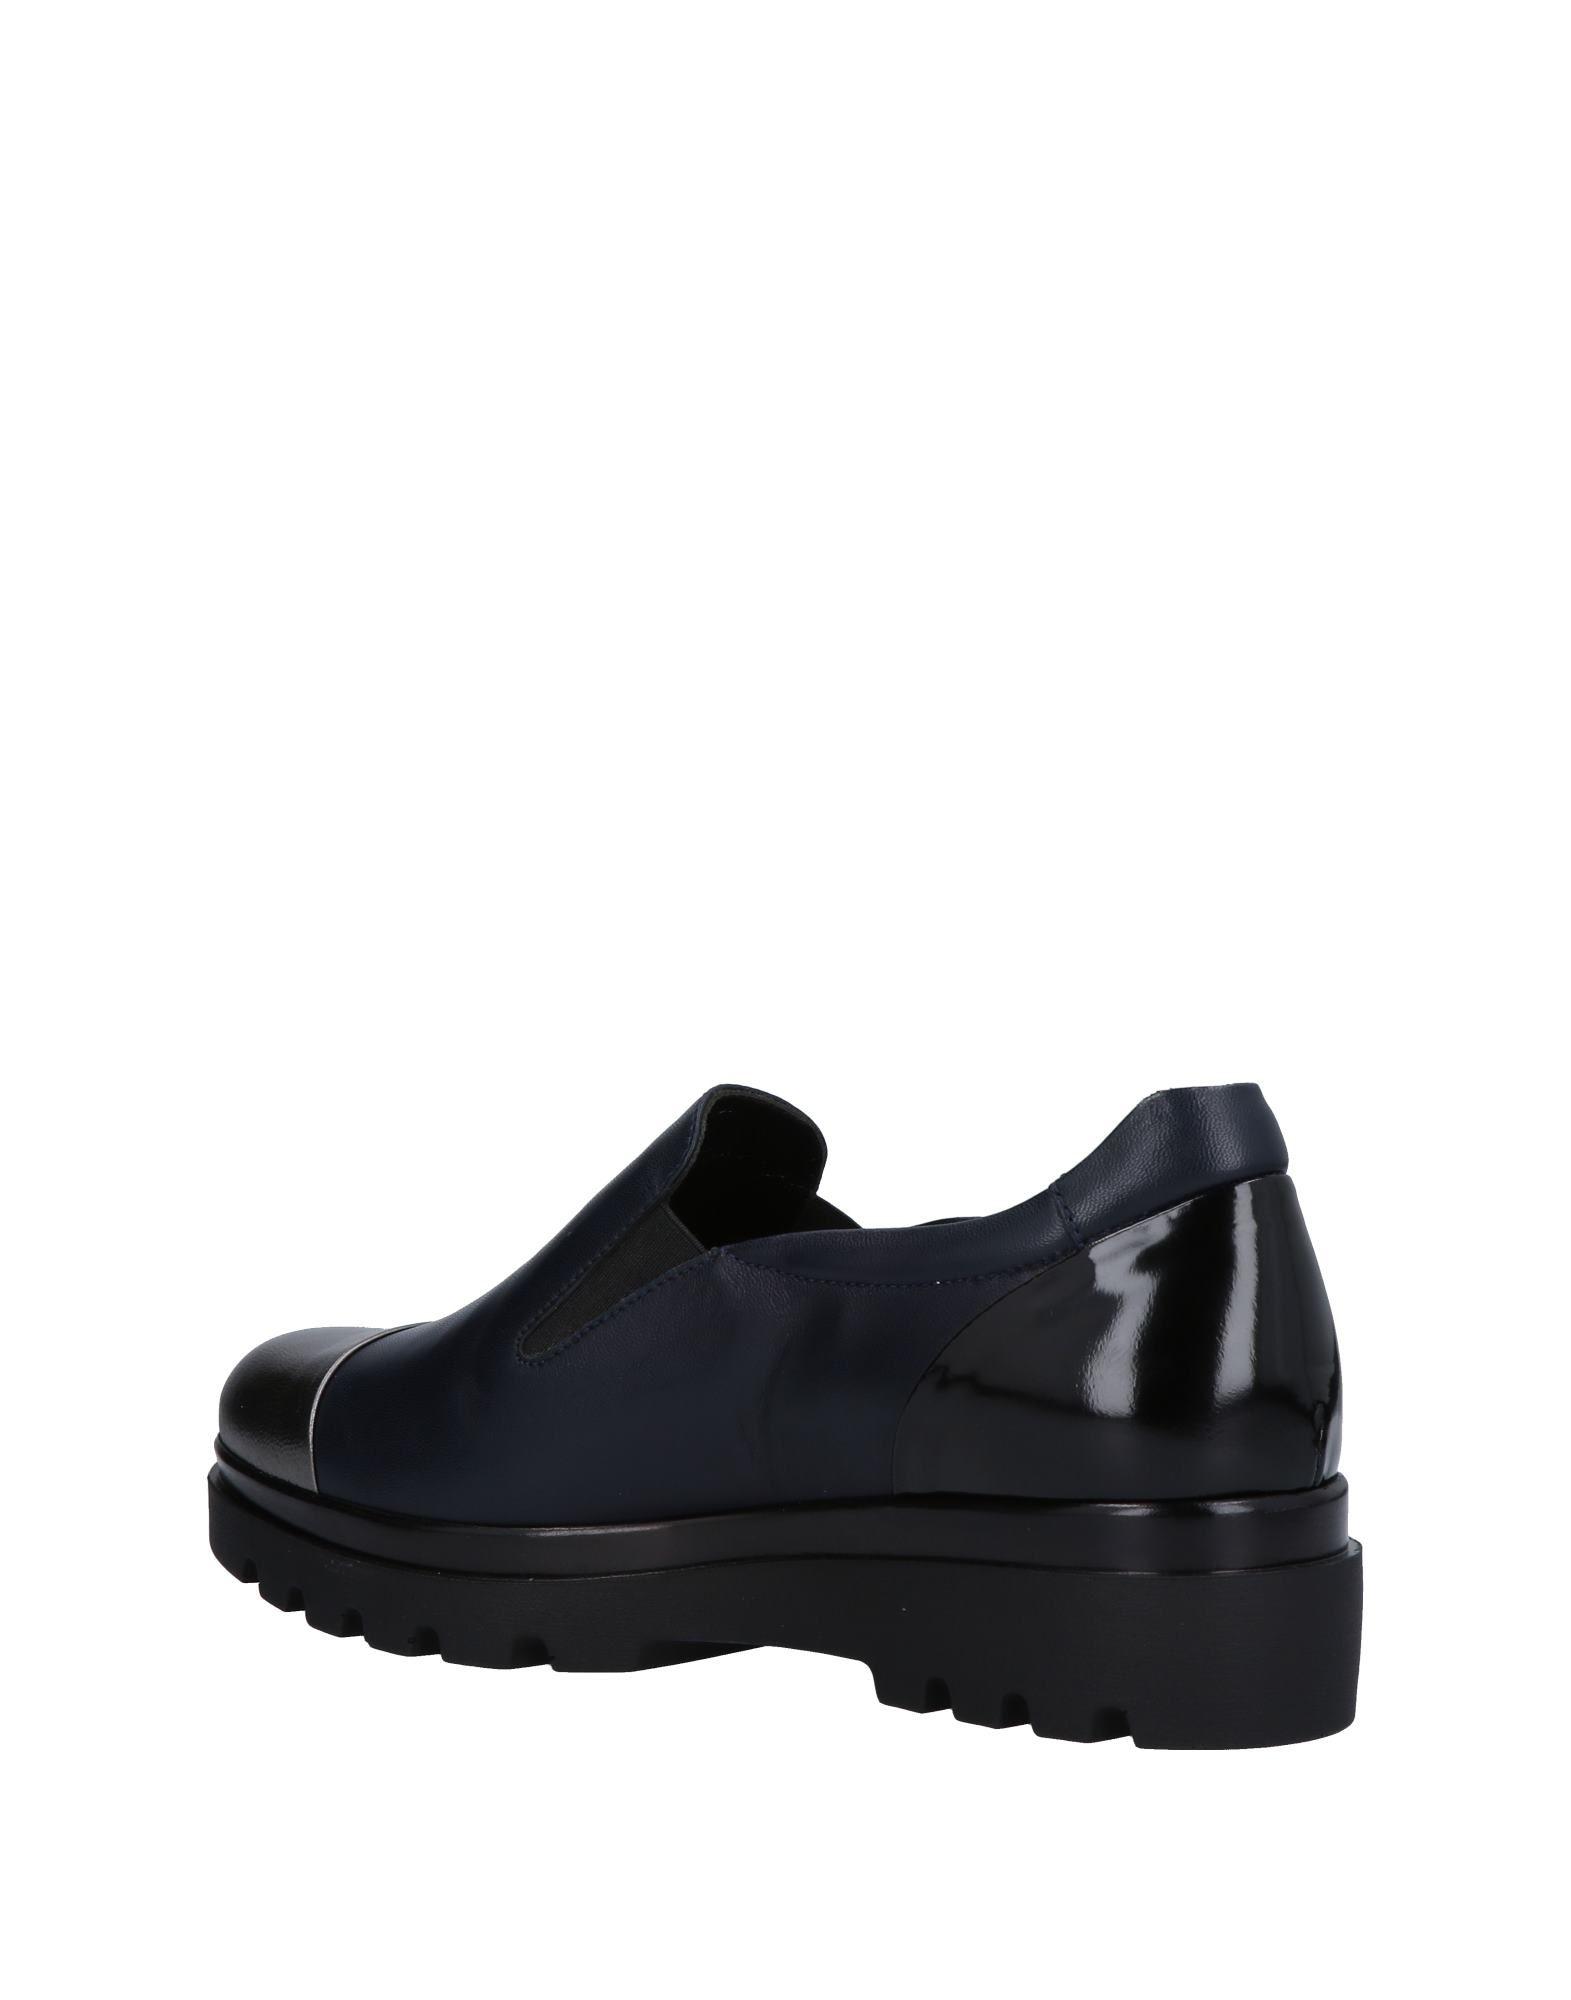 Haltbare Mode billige Schuhe Schuhe billige Mot 11486756DU Beliebte Schuhe c6bcec